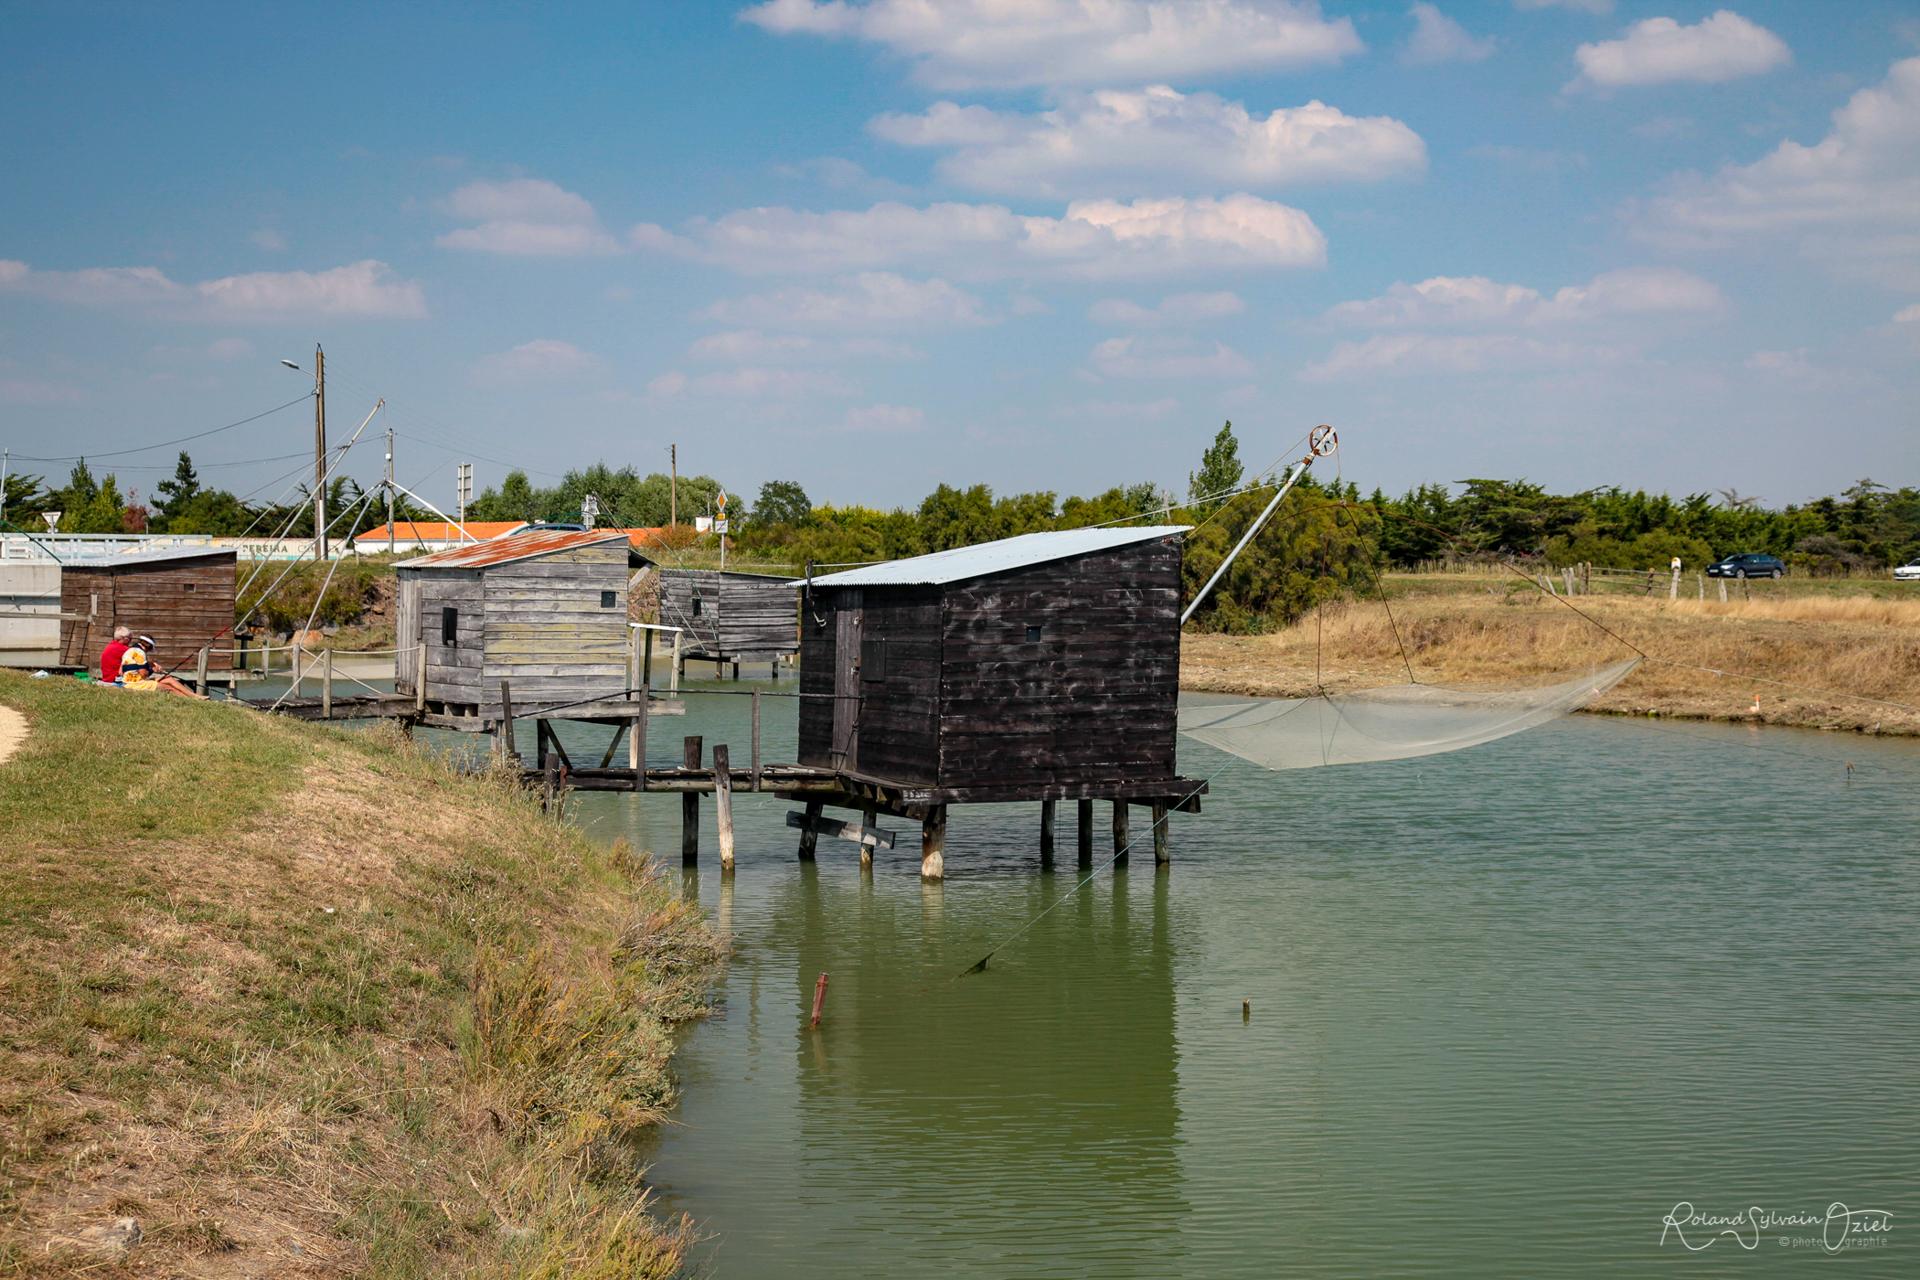 Cabane de pêche de la Barre de Monts